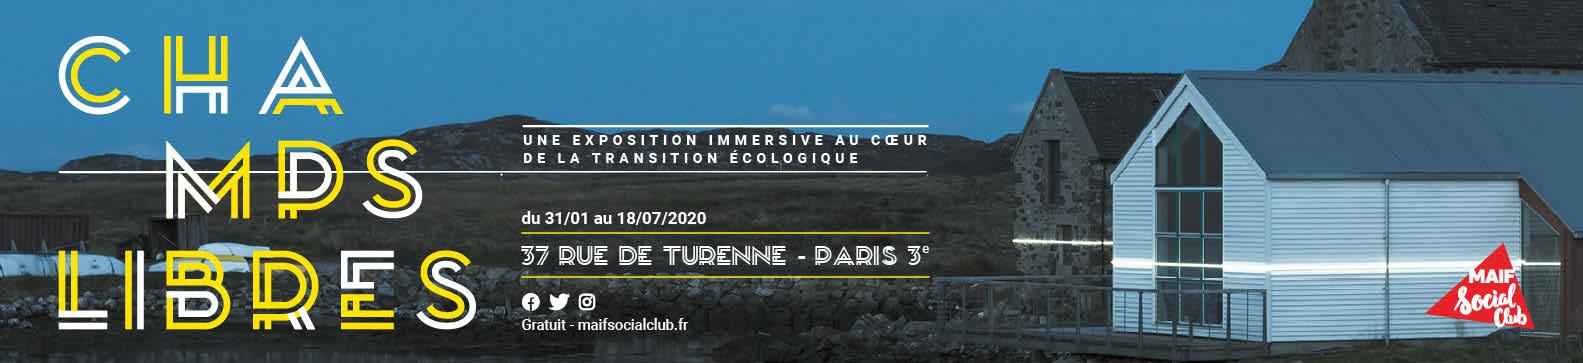 TRANSITION_banniere-IL_DOLI-VIER_1140x261-px_02-2020.jpg